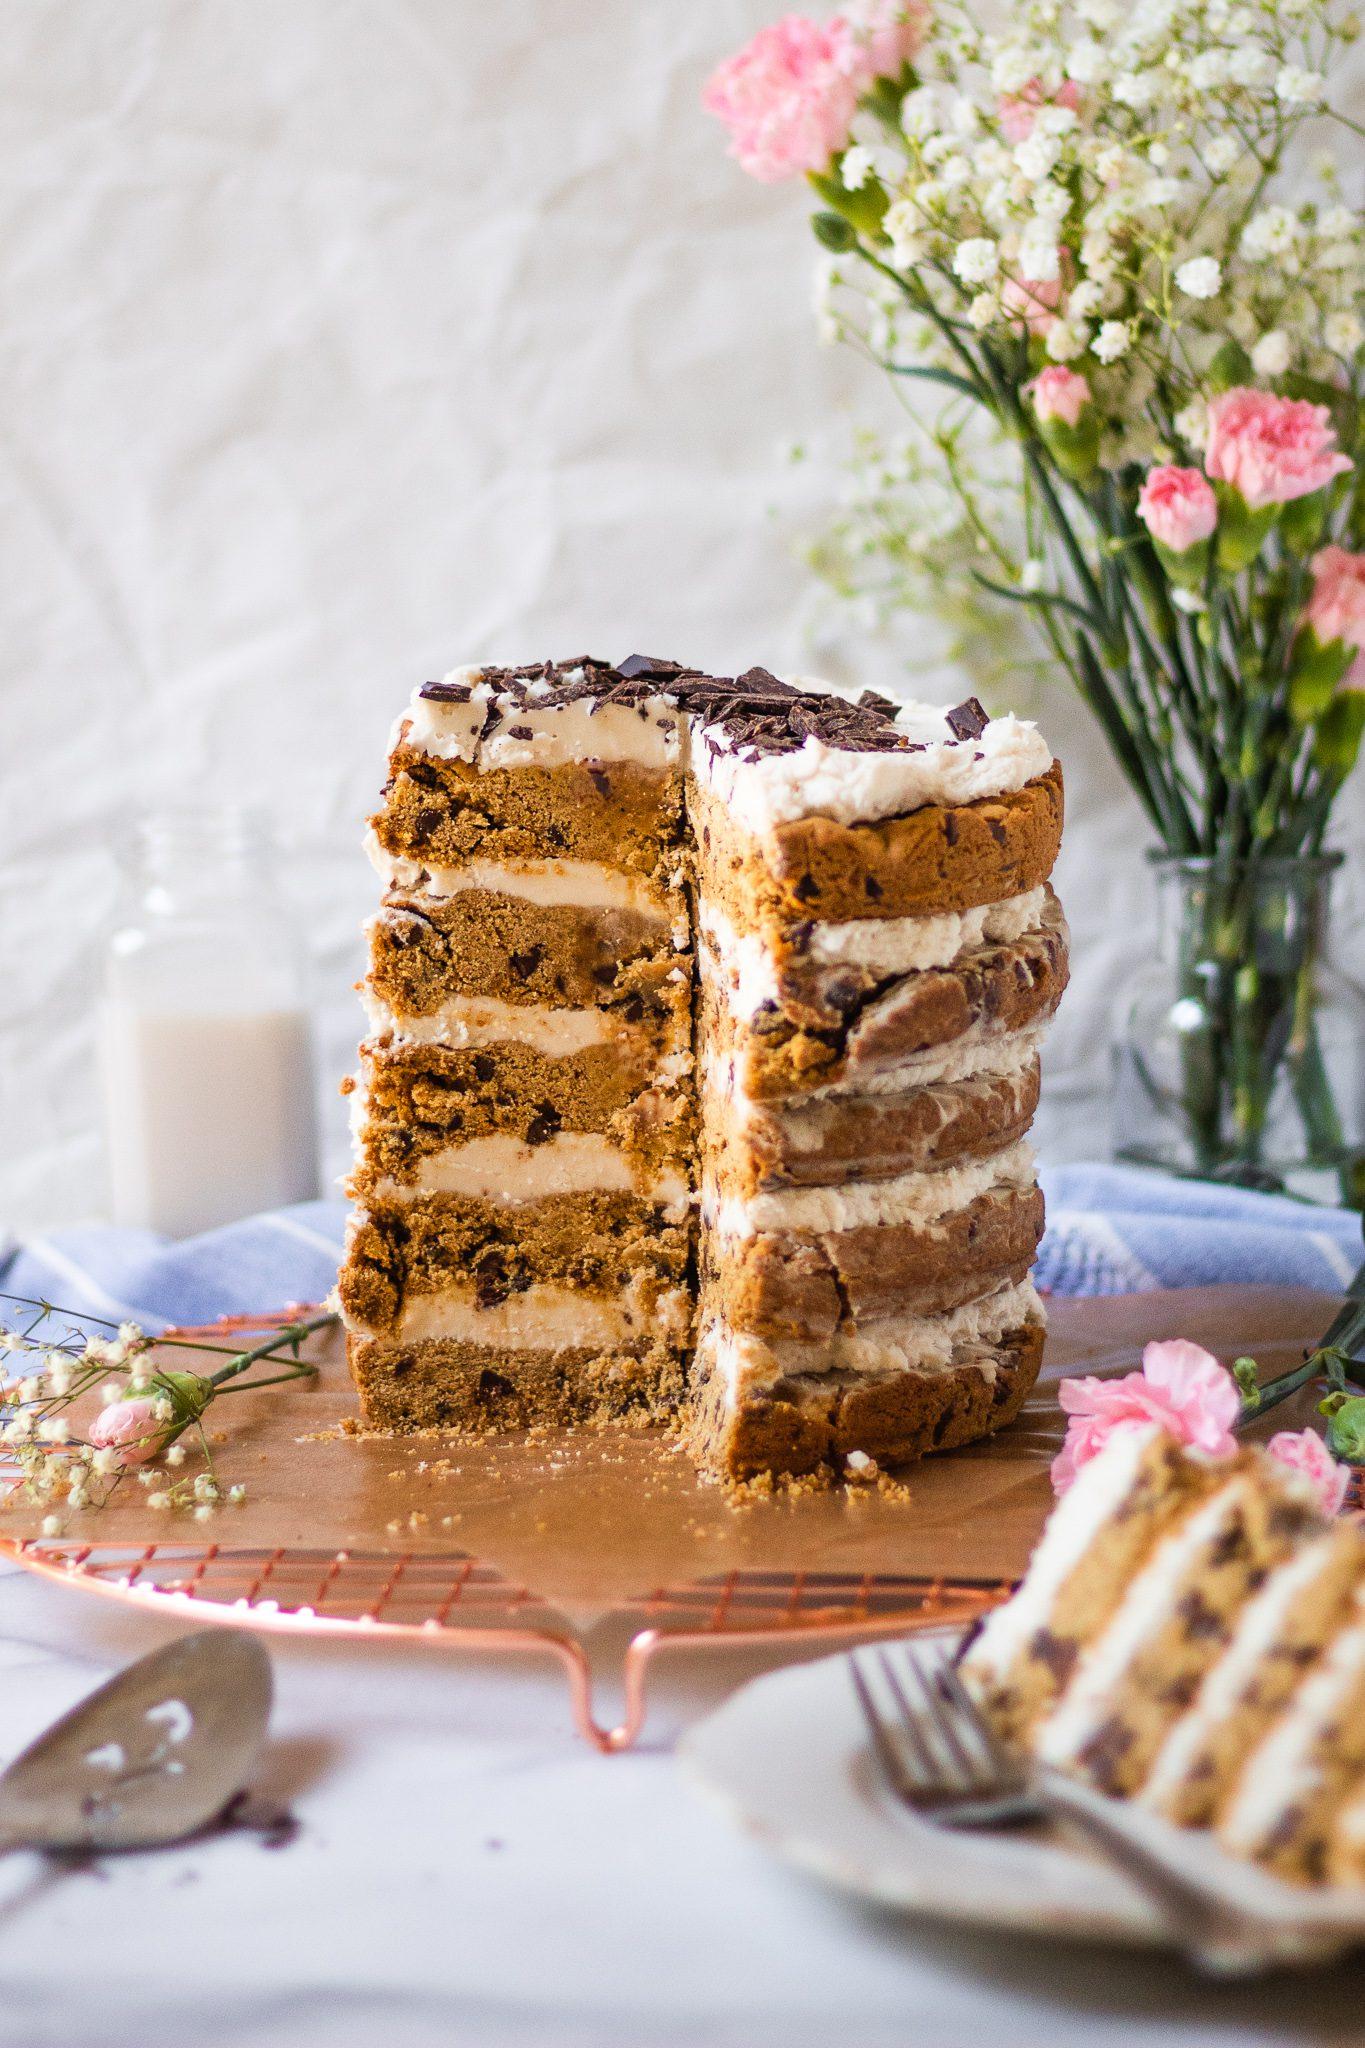 The BEST Chocolate Chip Cookie Layer Cake (Vegan, Gluten Free)